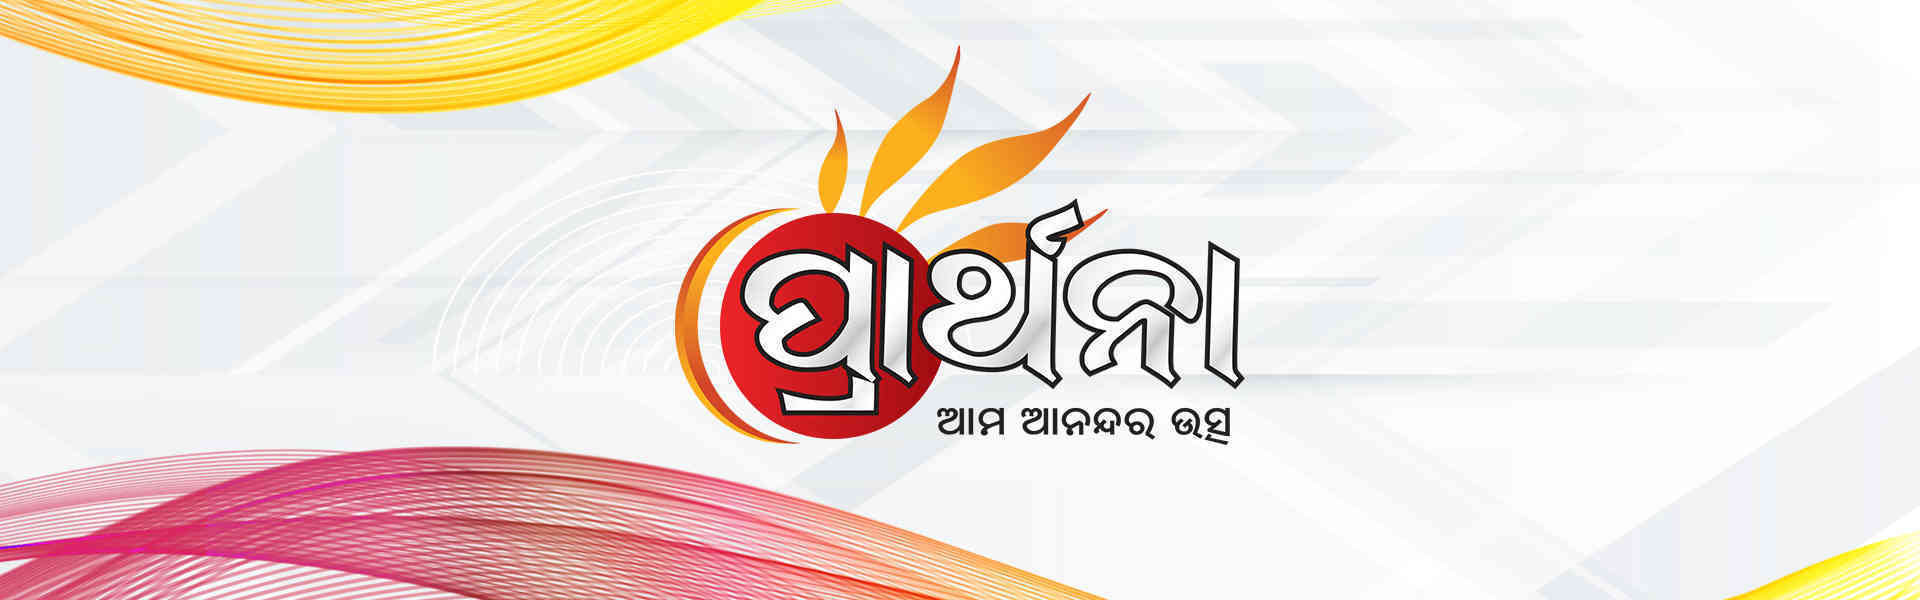 Prarthana TV